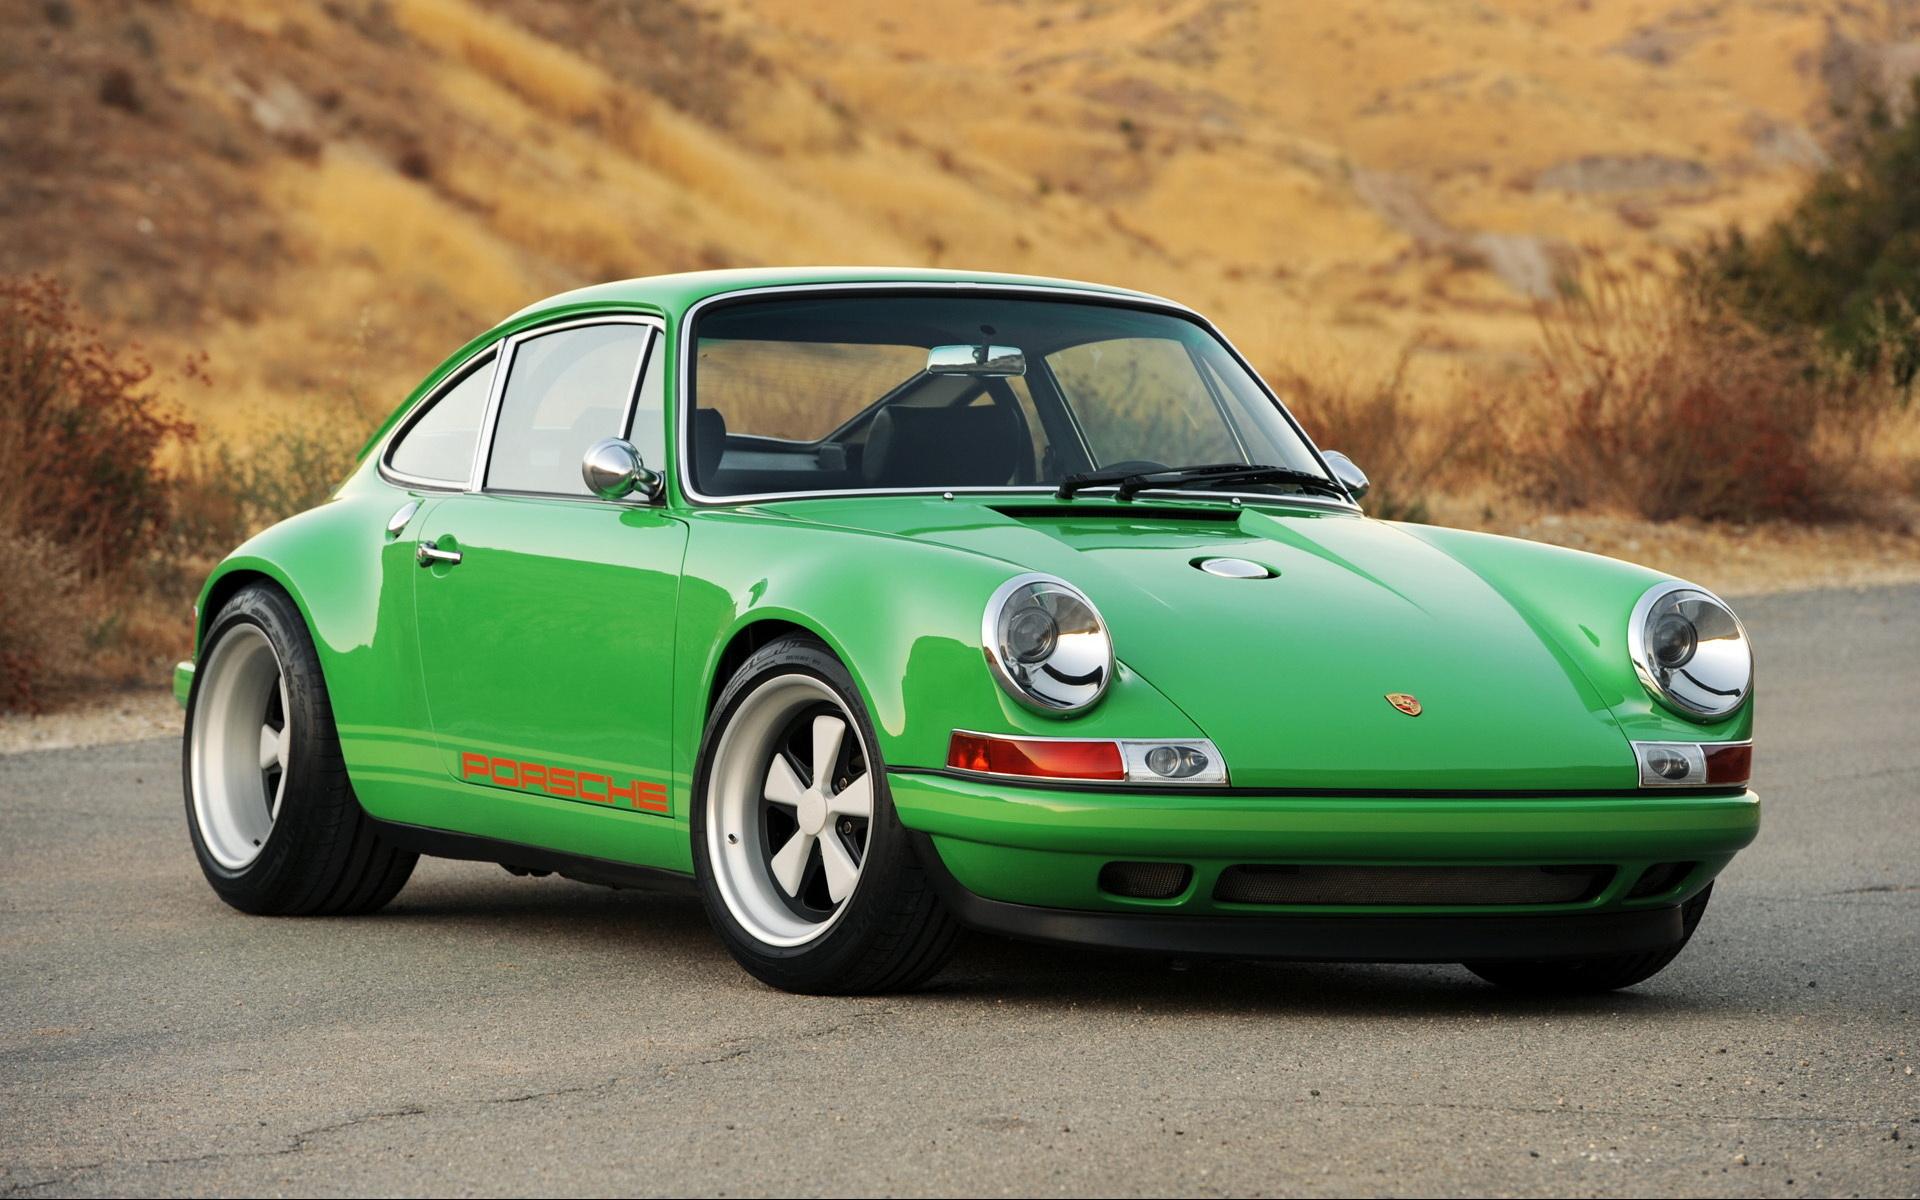 Porsche 911 singer cars landscapes wallpaper